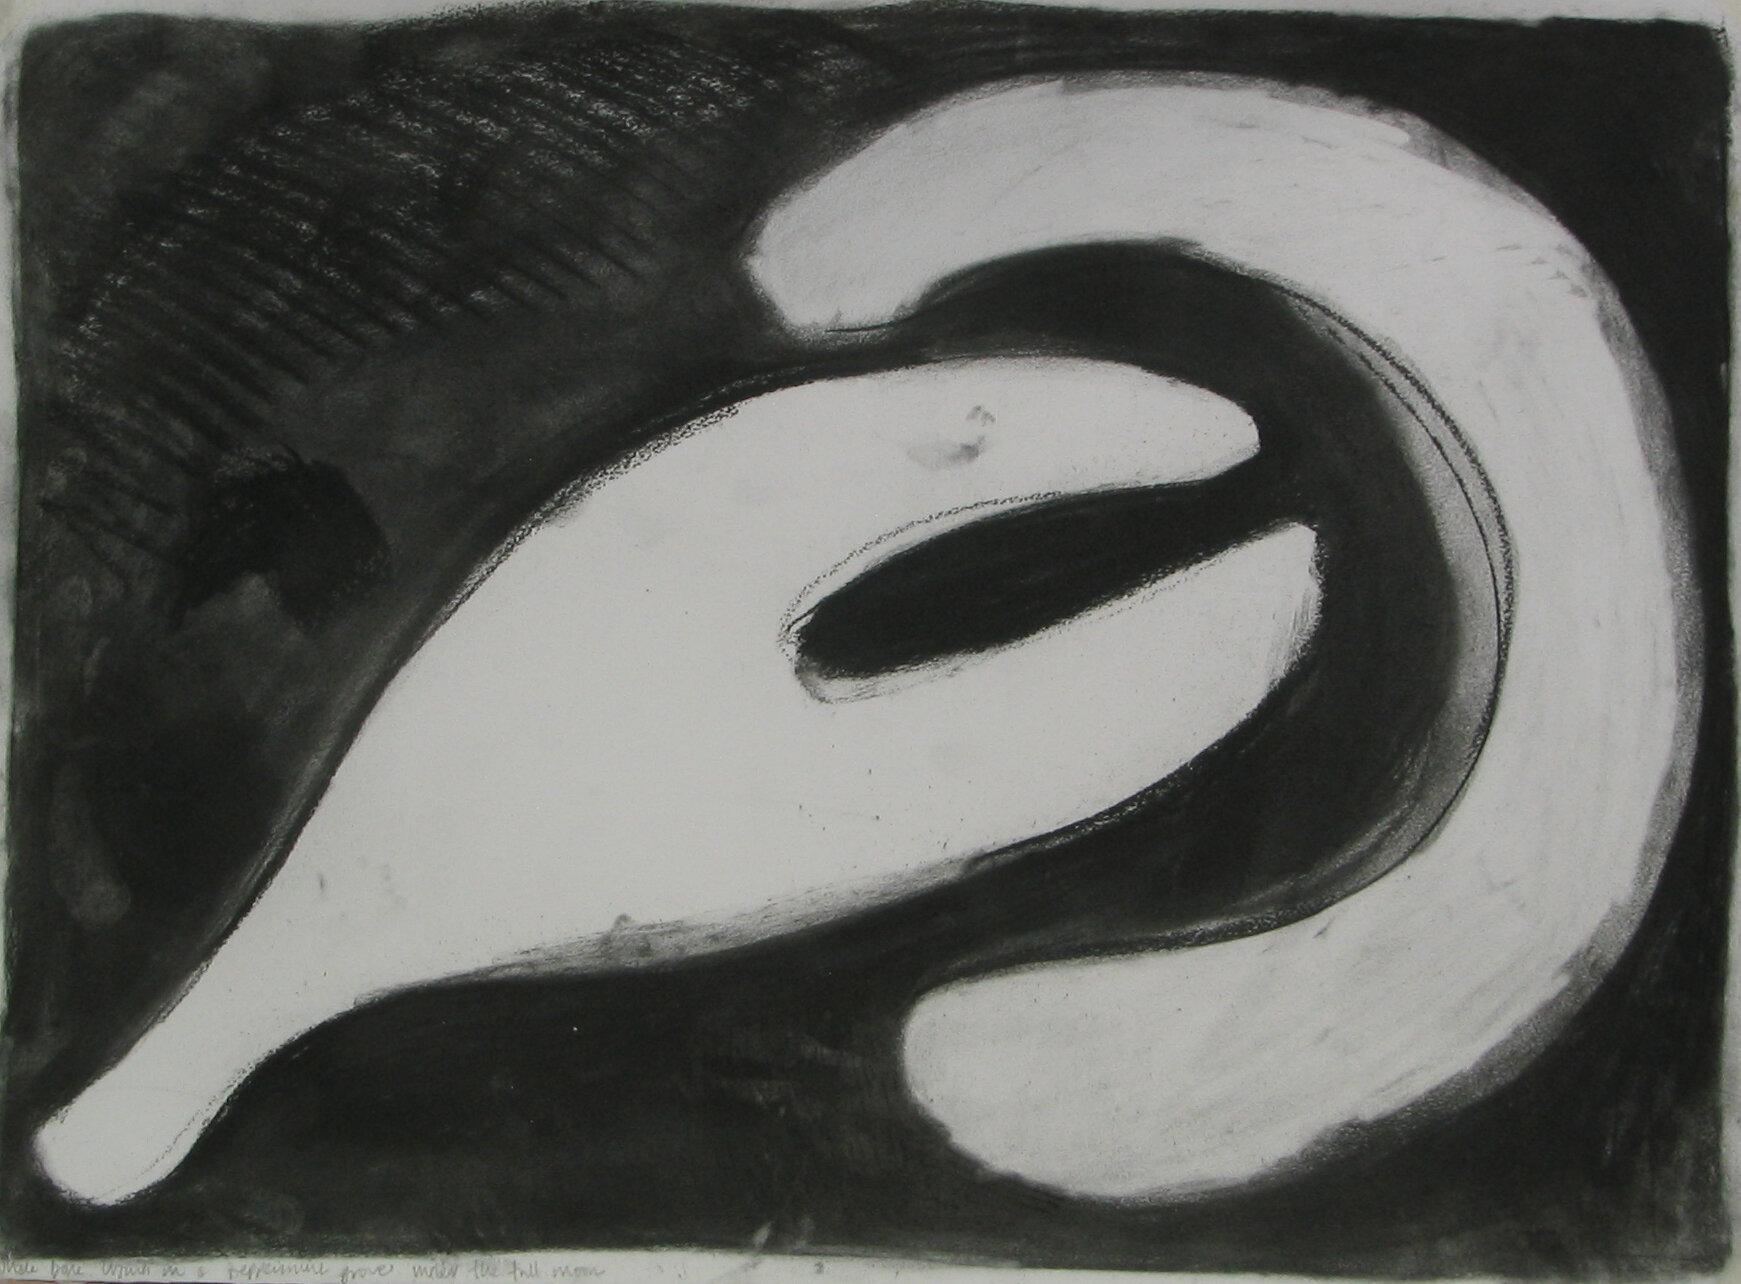 Whale bones in the peppermint grove.jpg